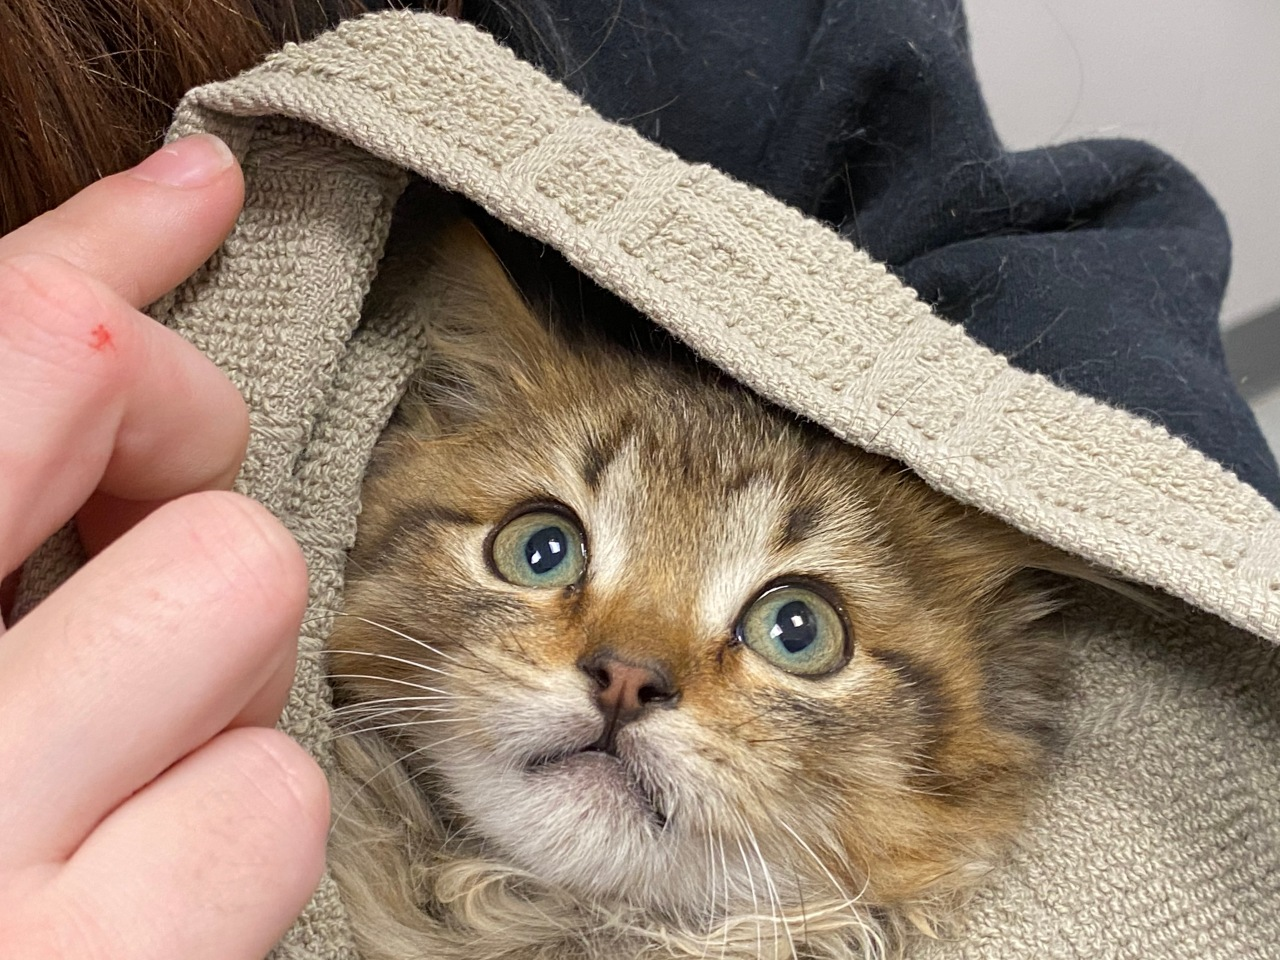 Good Samaritan saves kitten frozen to truck tire in Colorado